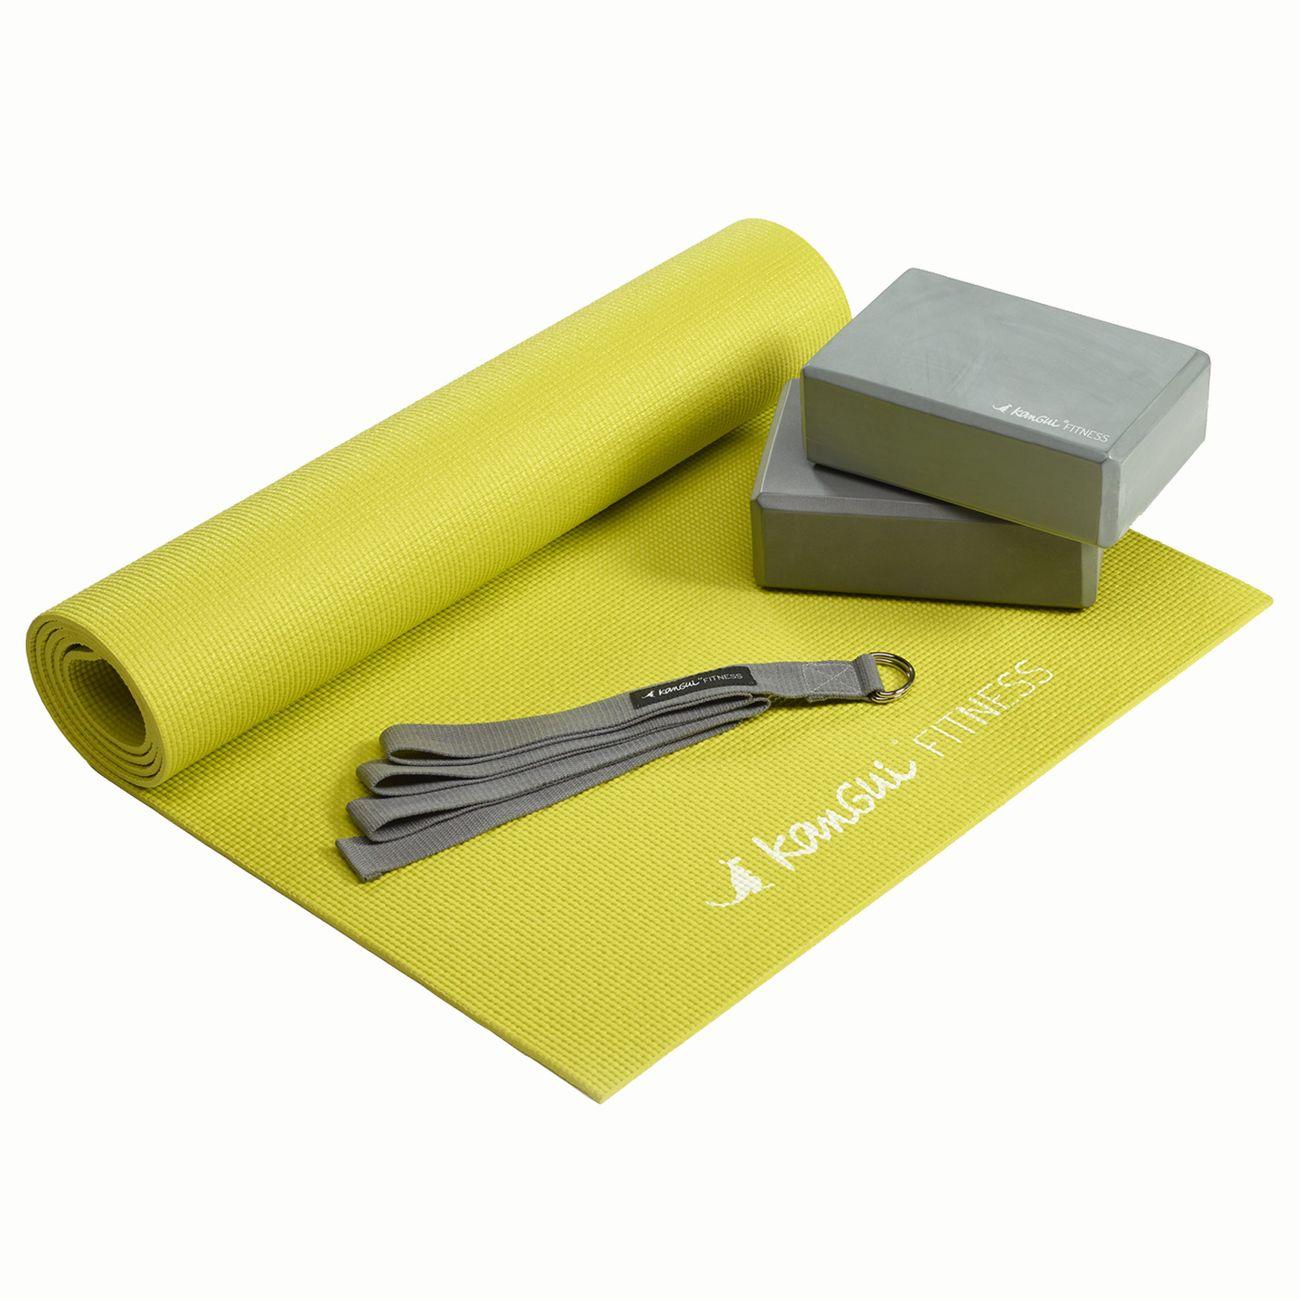 KANGUI Kangui - Kit d'accessoires de yoga - PACK YOGA BASIC